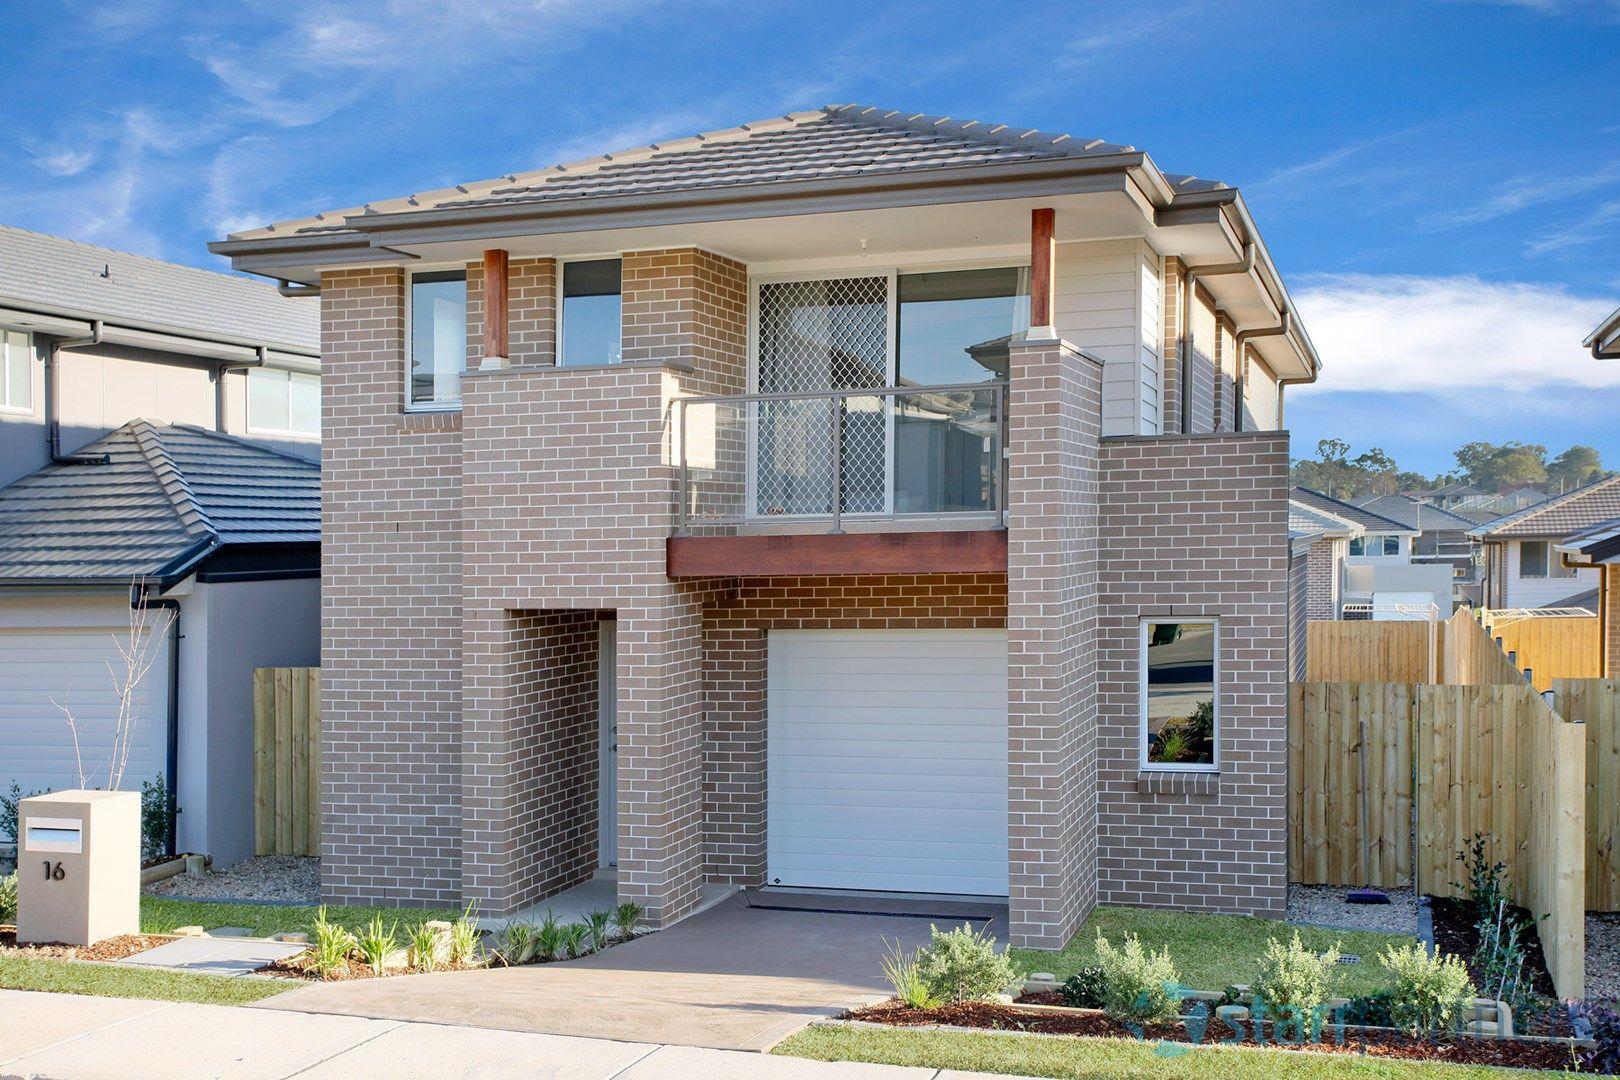 16 Grattan Road, Kellyville NSW 2155, Image 0